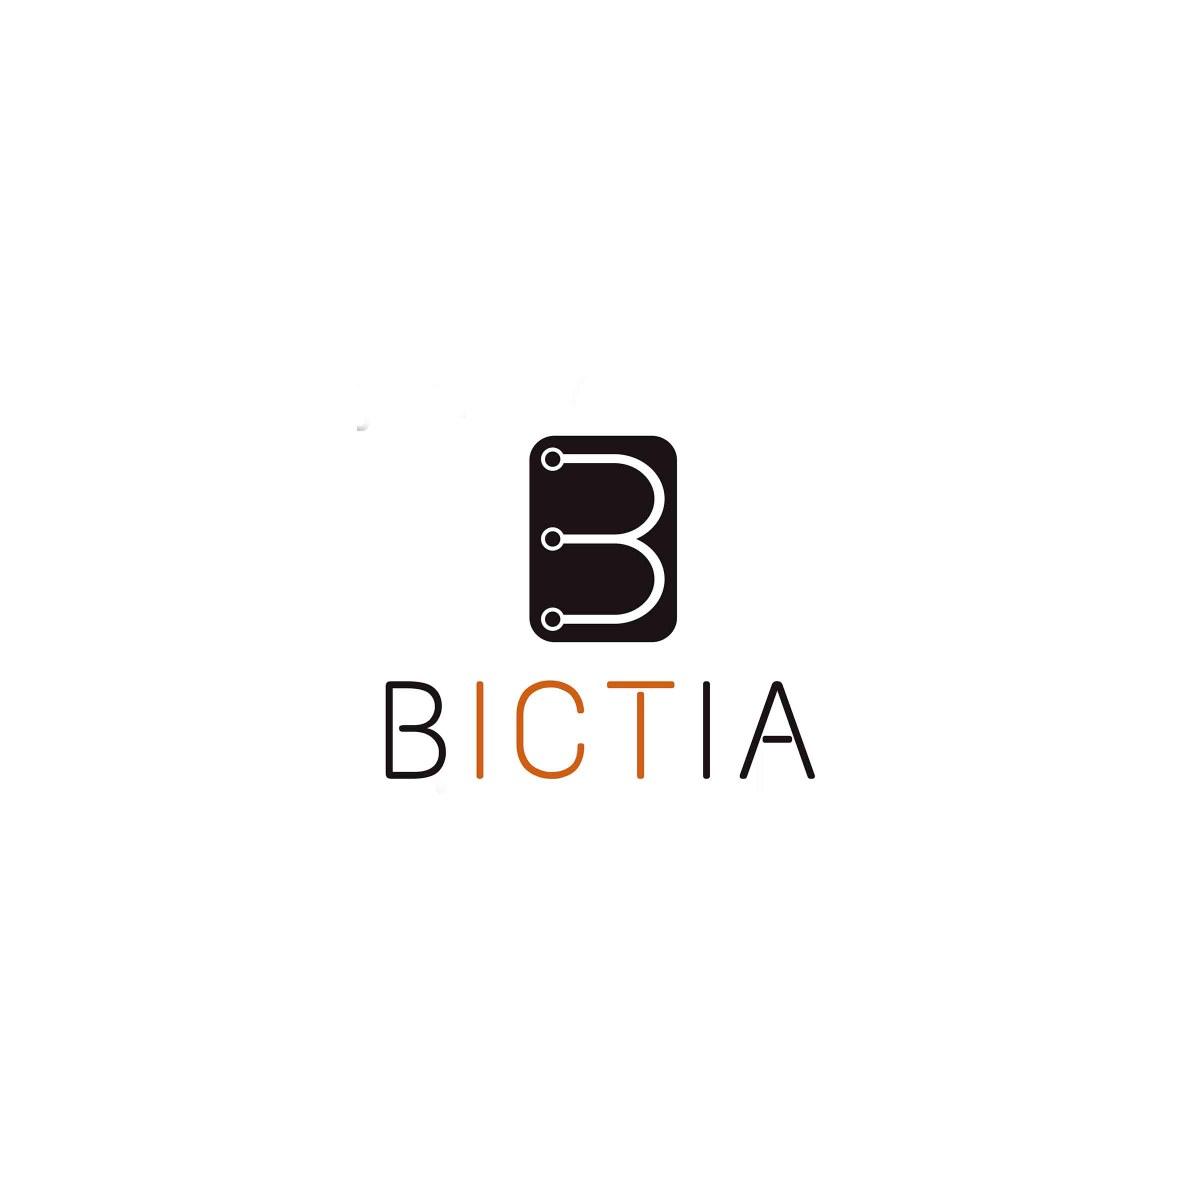 Bictia-1